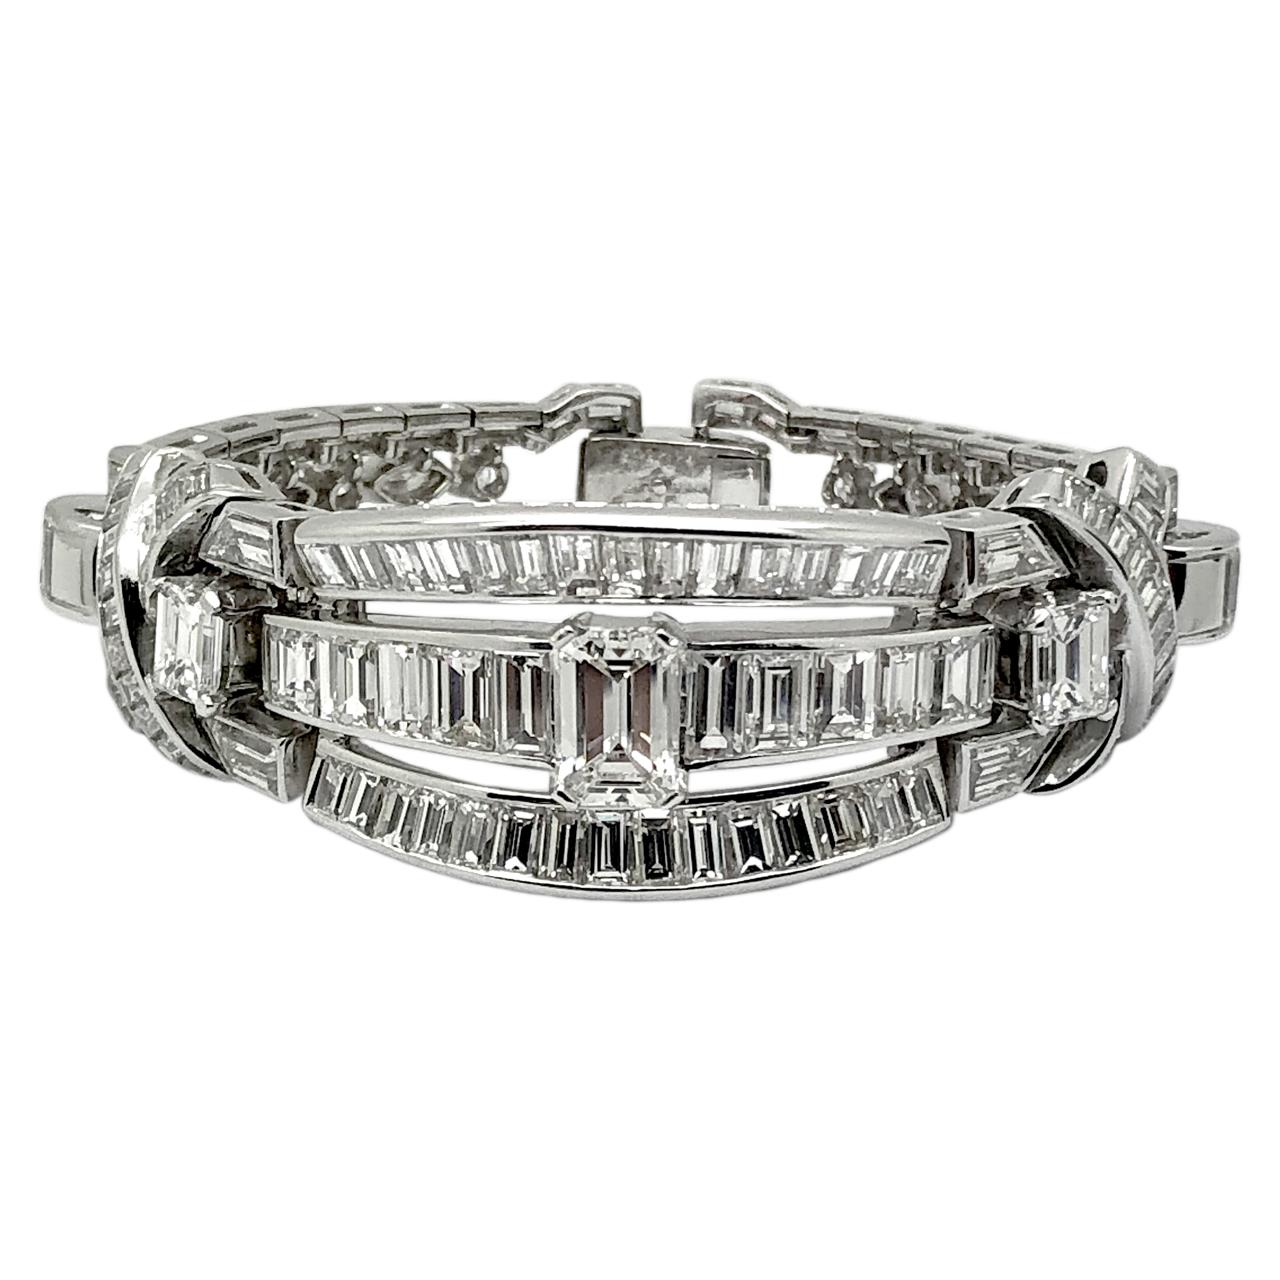 1950s platinum bracelet